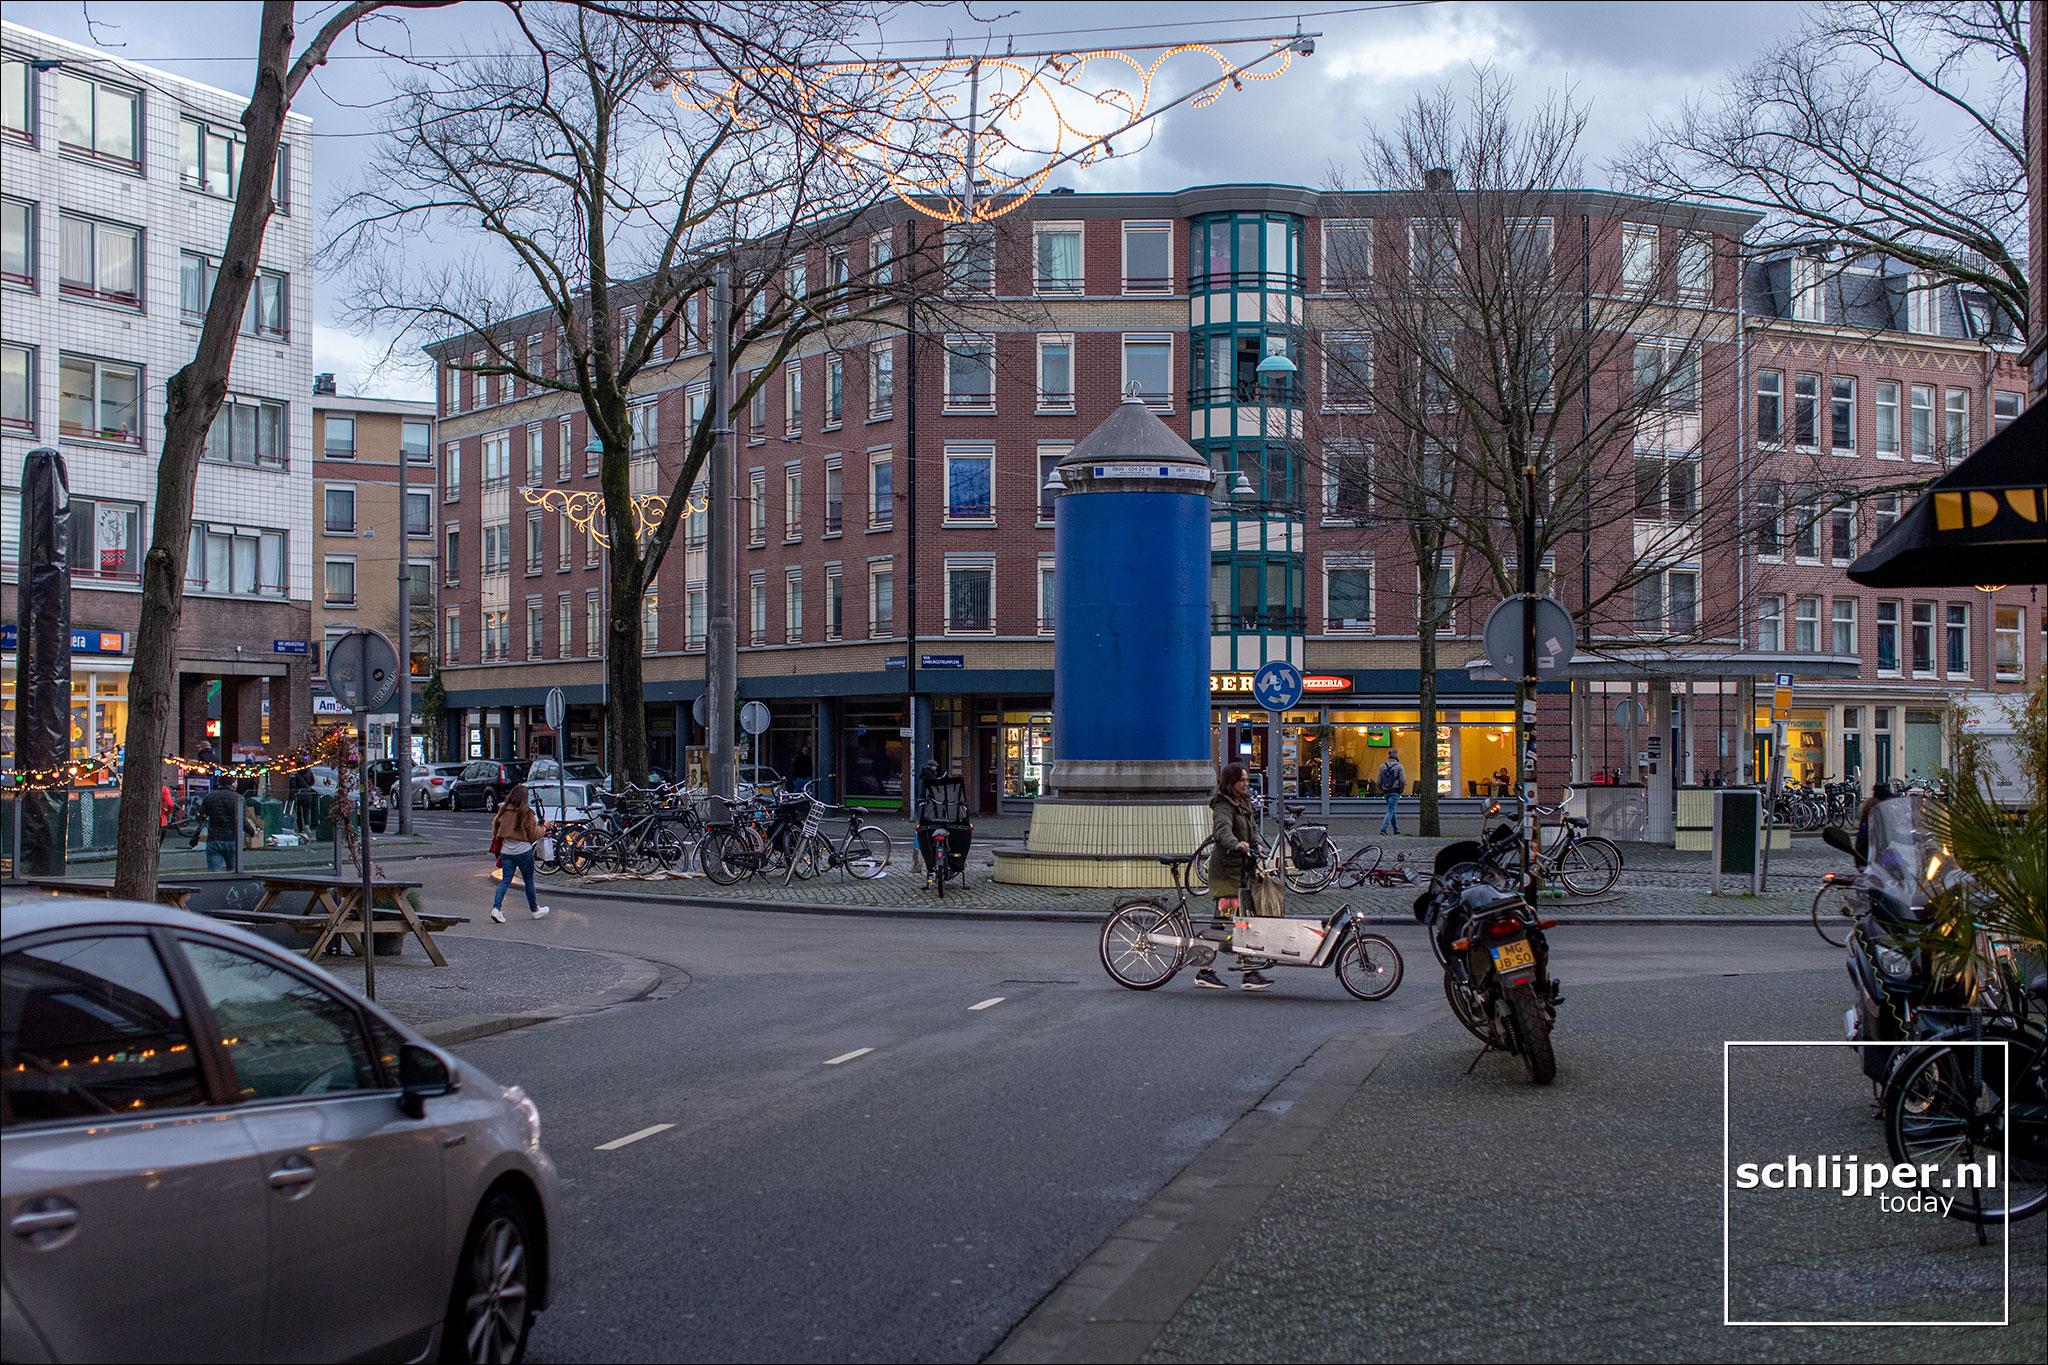 Nederland, Amsterdam, 8 december 2019